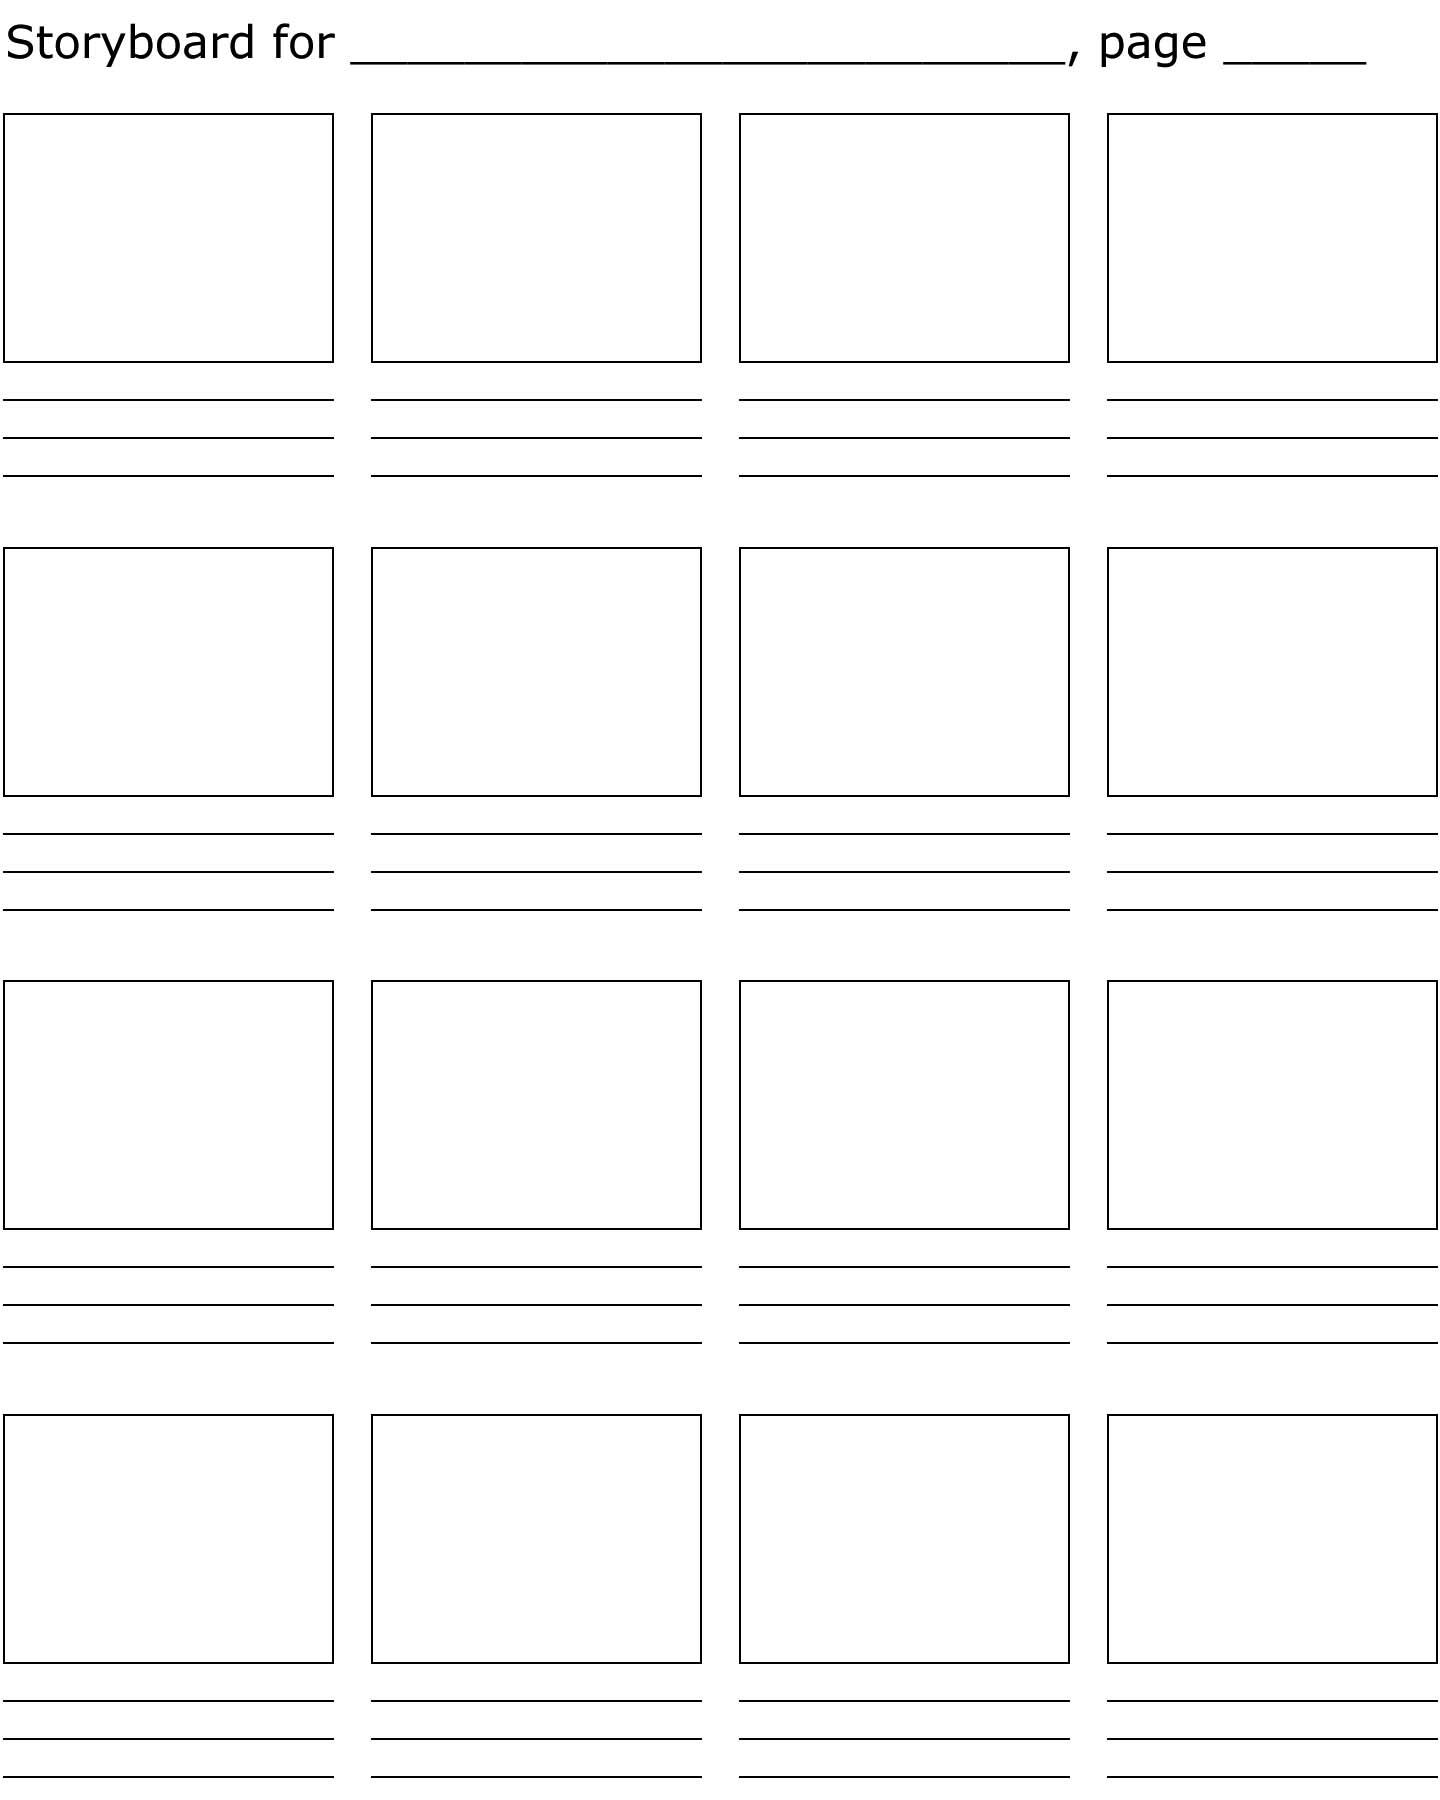 Free Storyboard Printable Download Free Clip Art Free